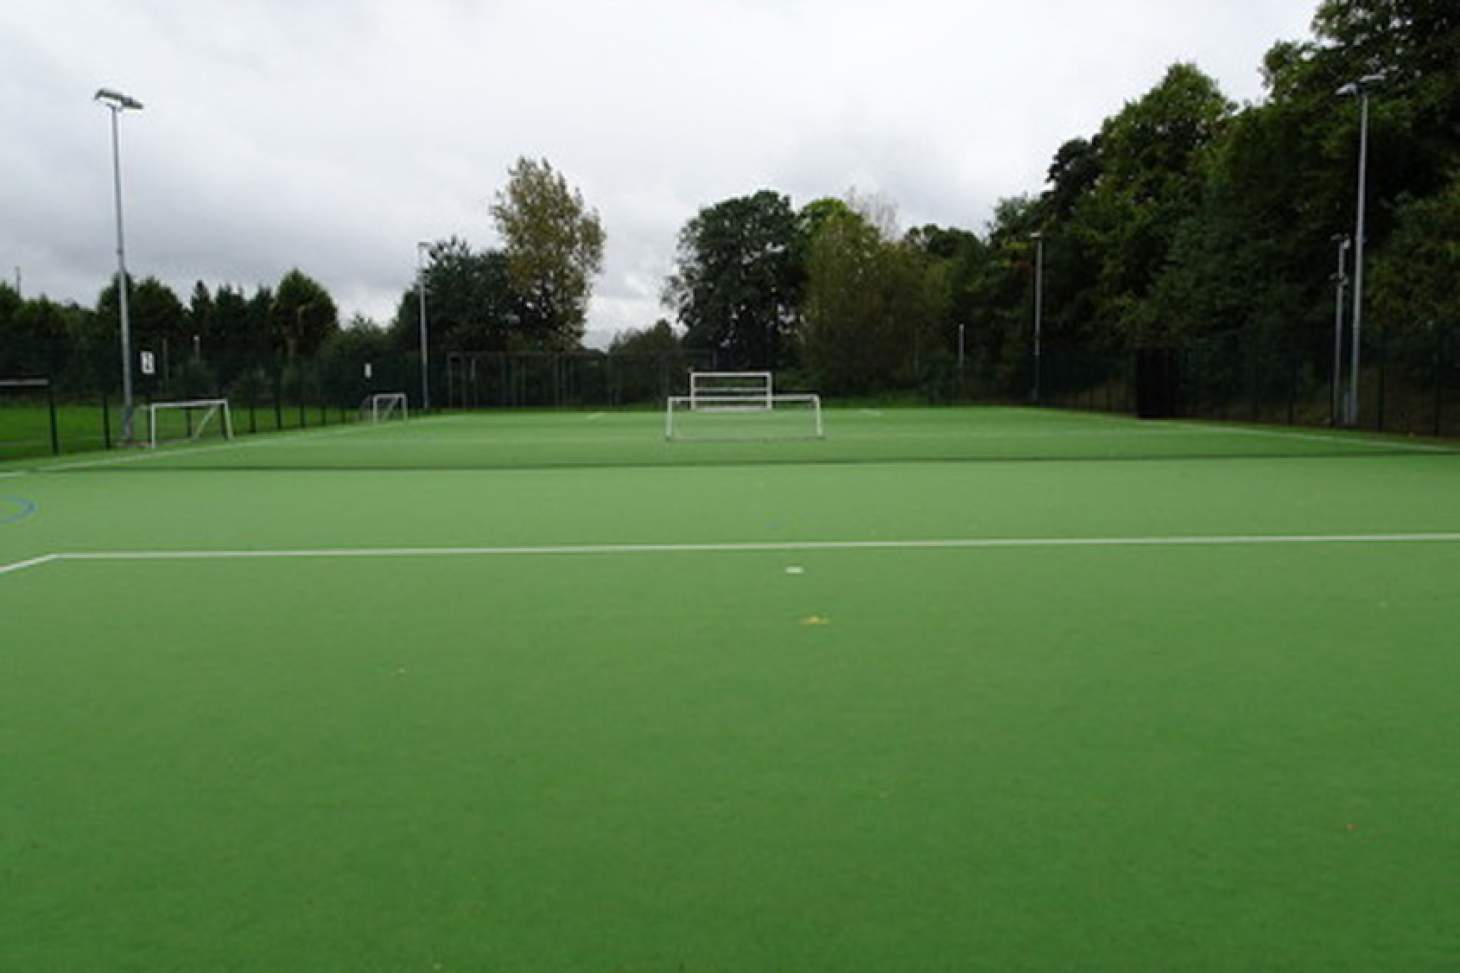 The Barlow RC High School Outdoor | Astroturf hockey pitch